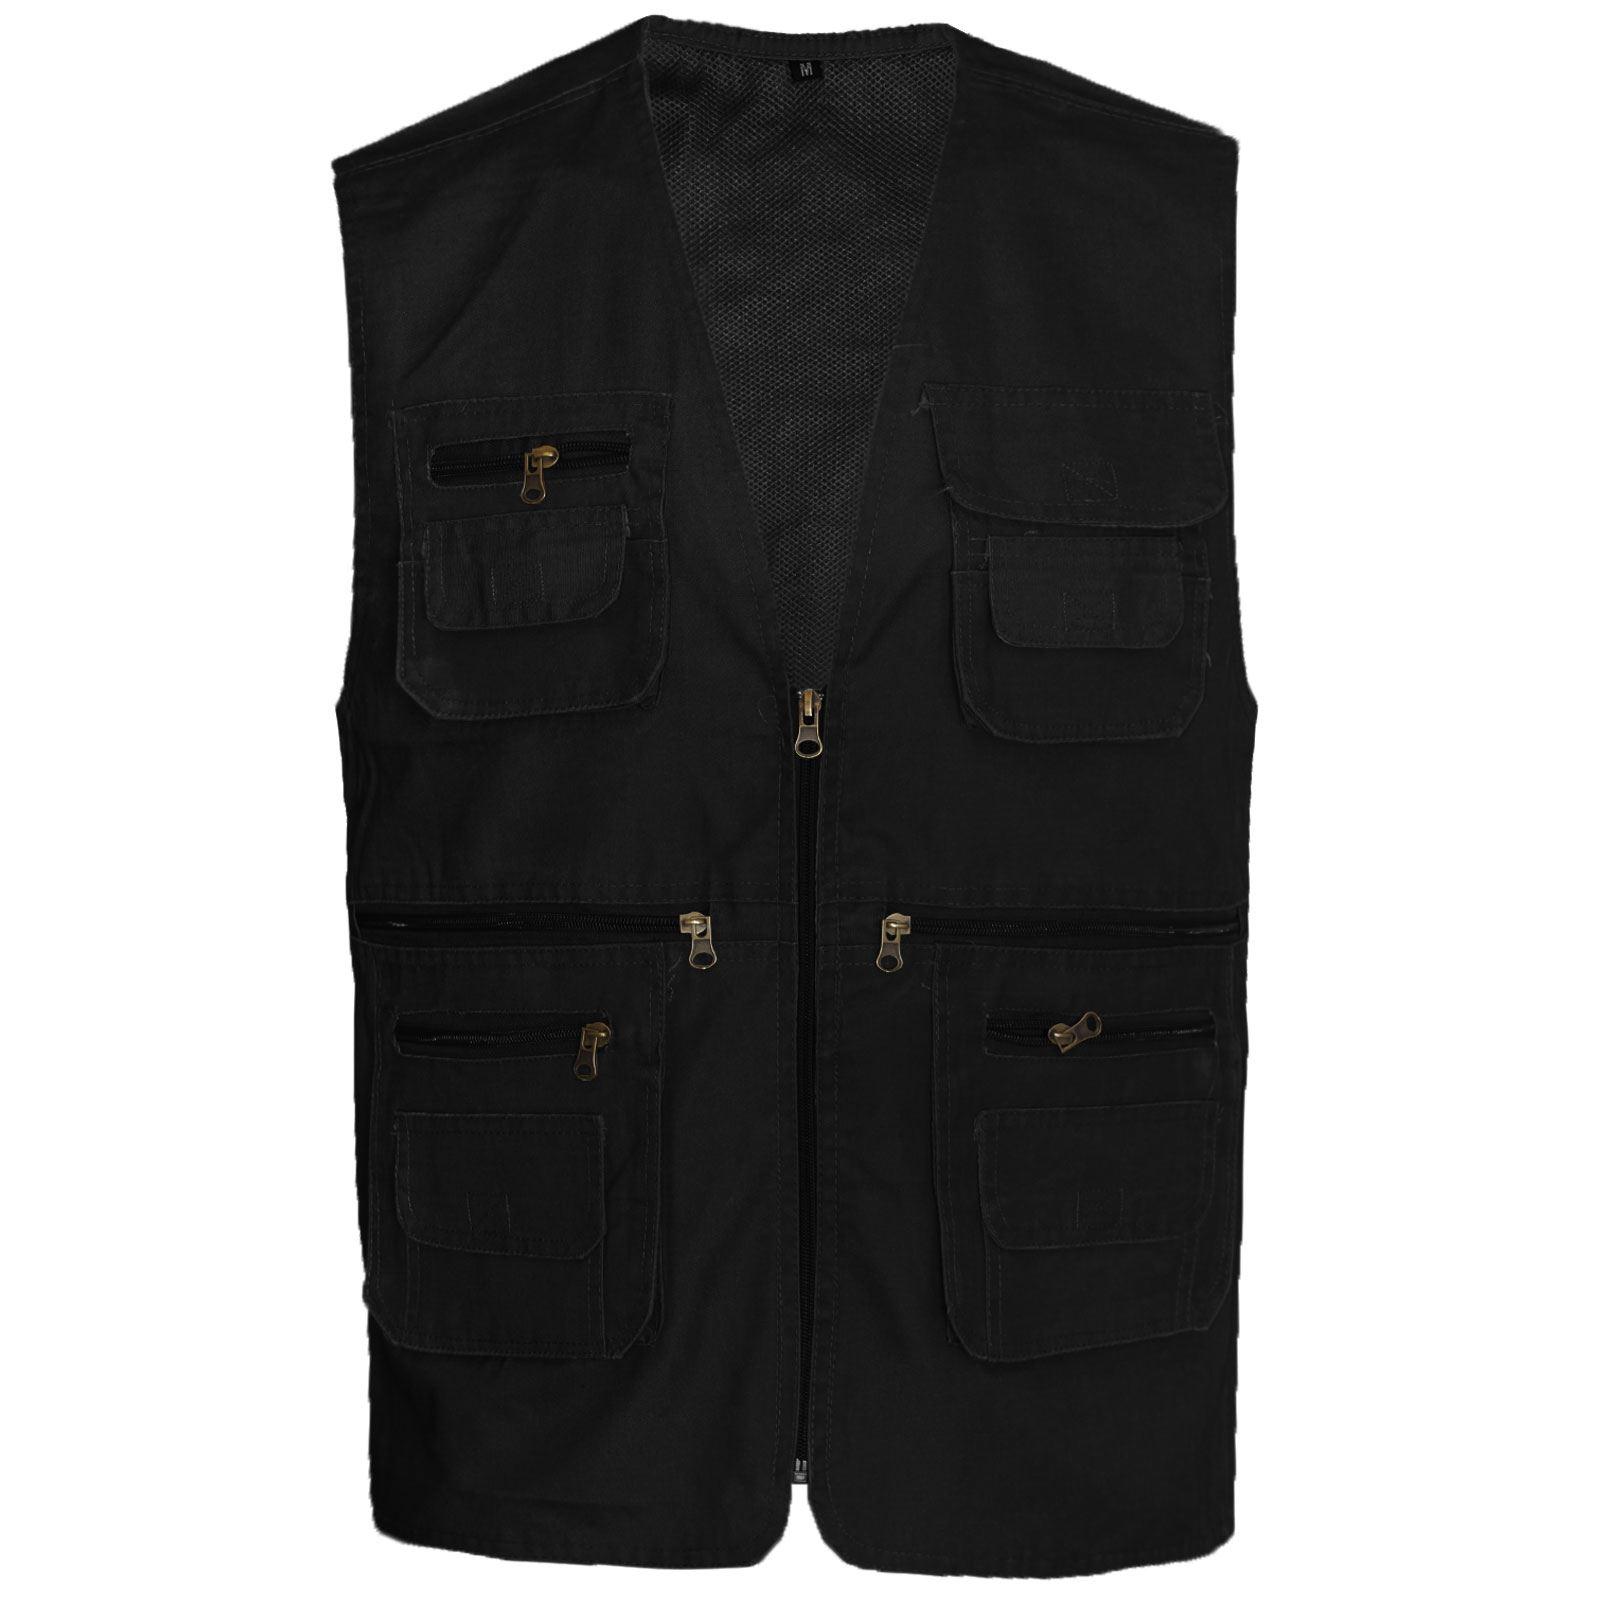 Mens multipockets lightweight casual summer gilet mesh for Lightweight fishing pants